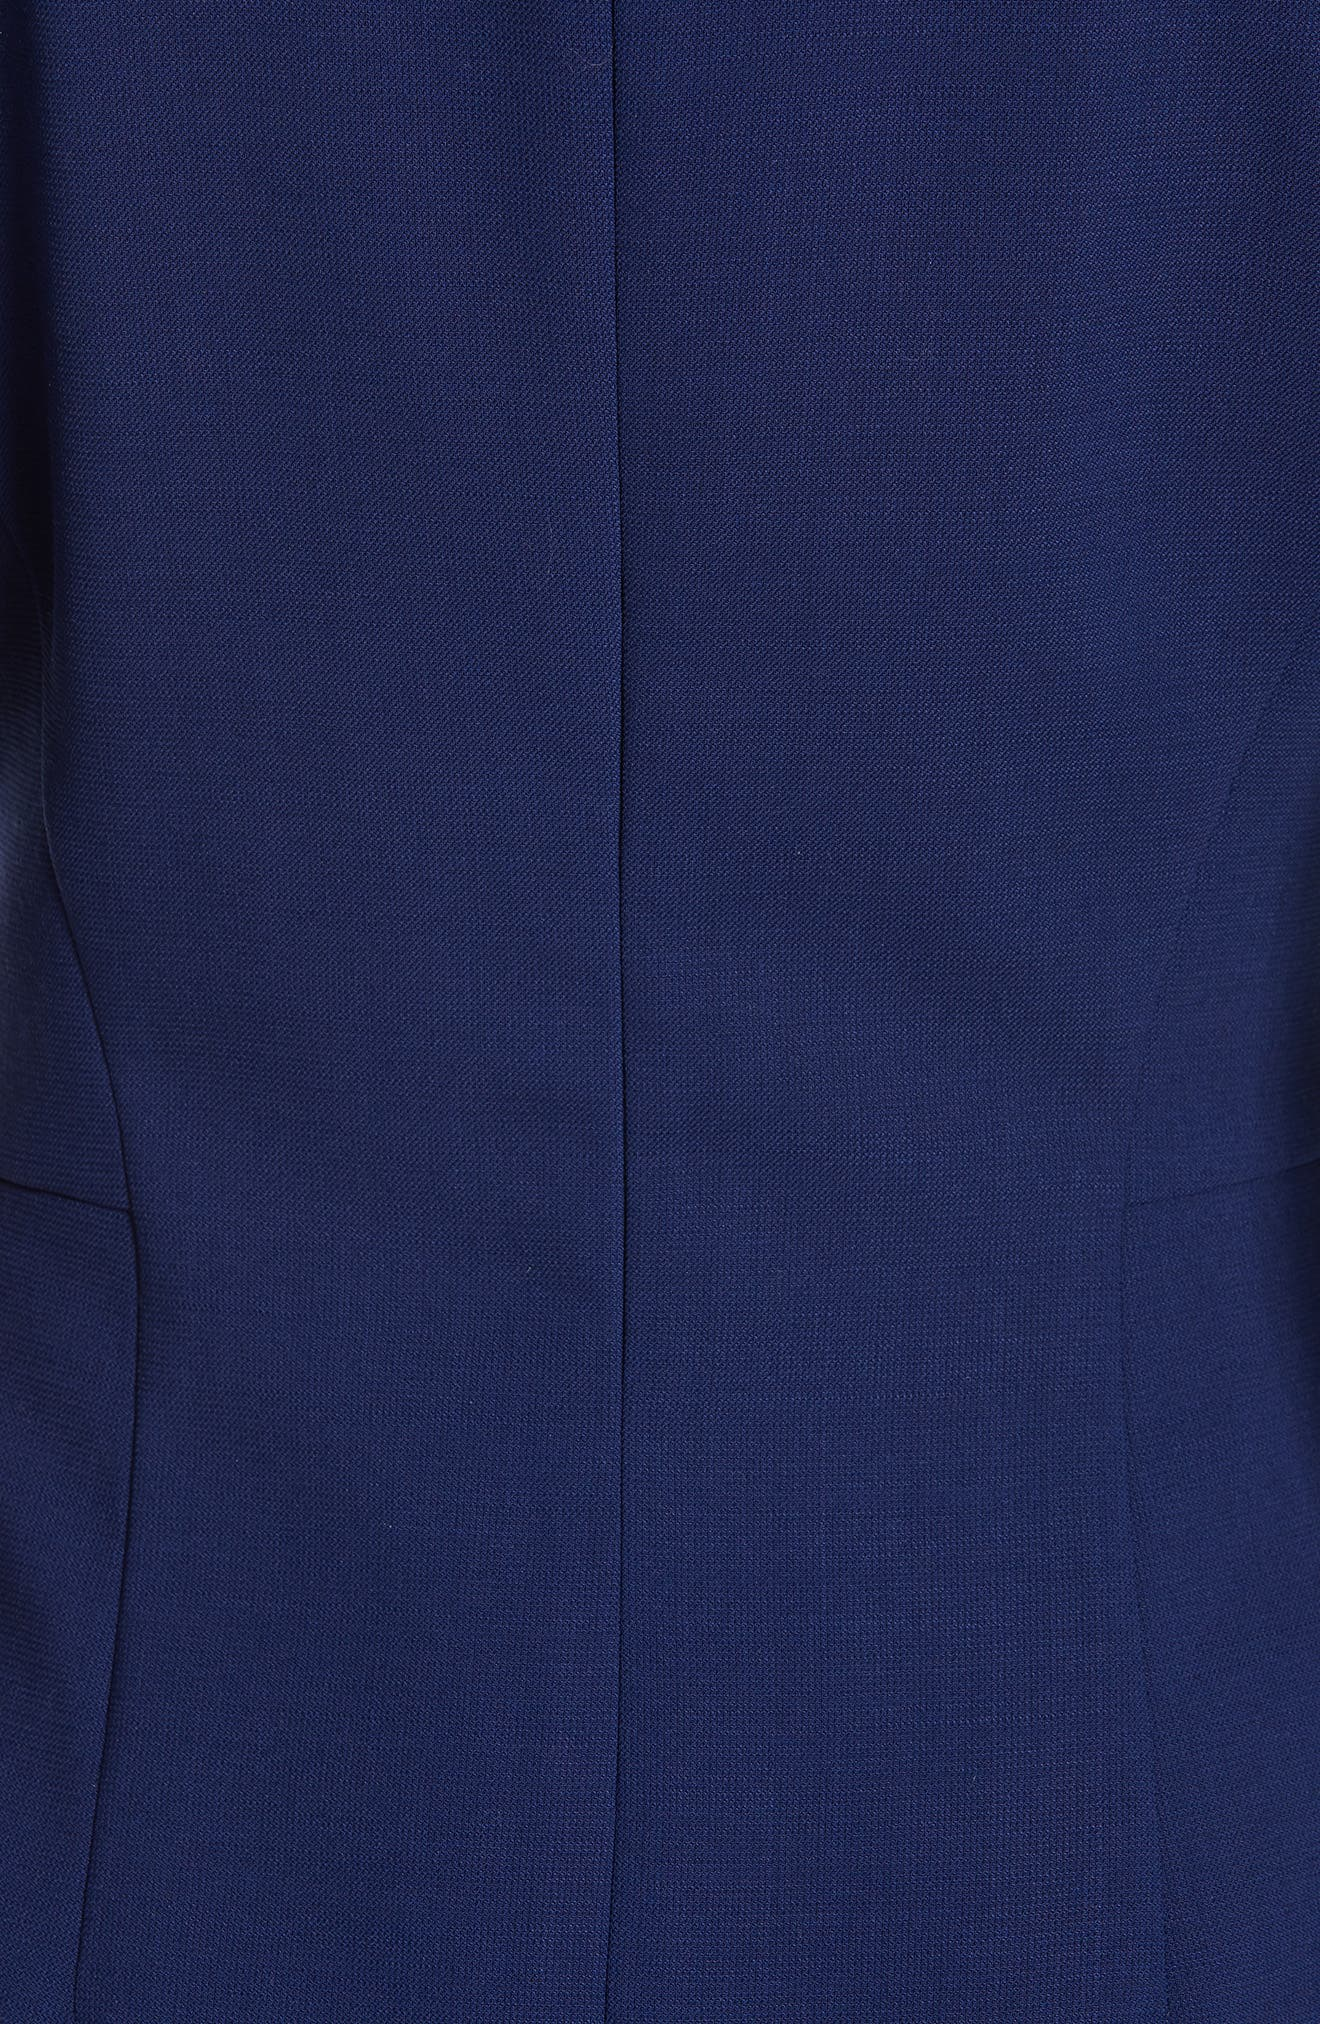 Danufa Stretch Wool Sheath Dress,                             Alternate thumbnail 6, color,                             INK BLUE